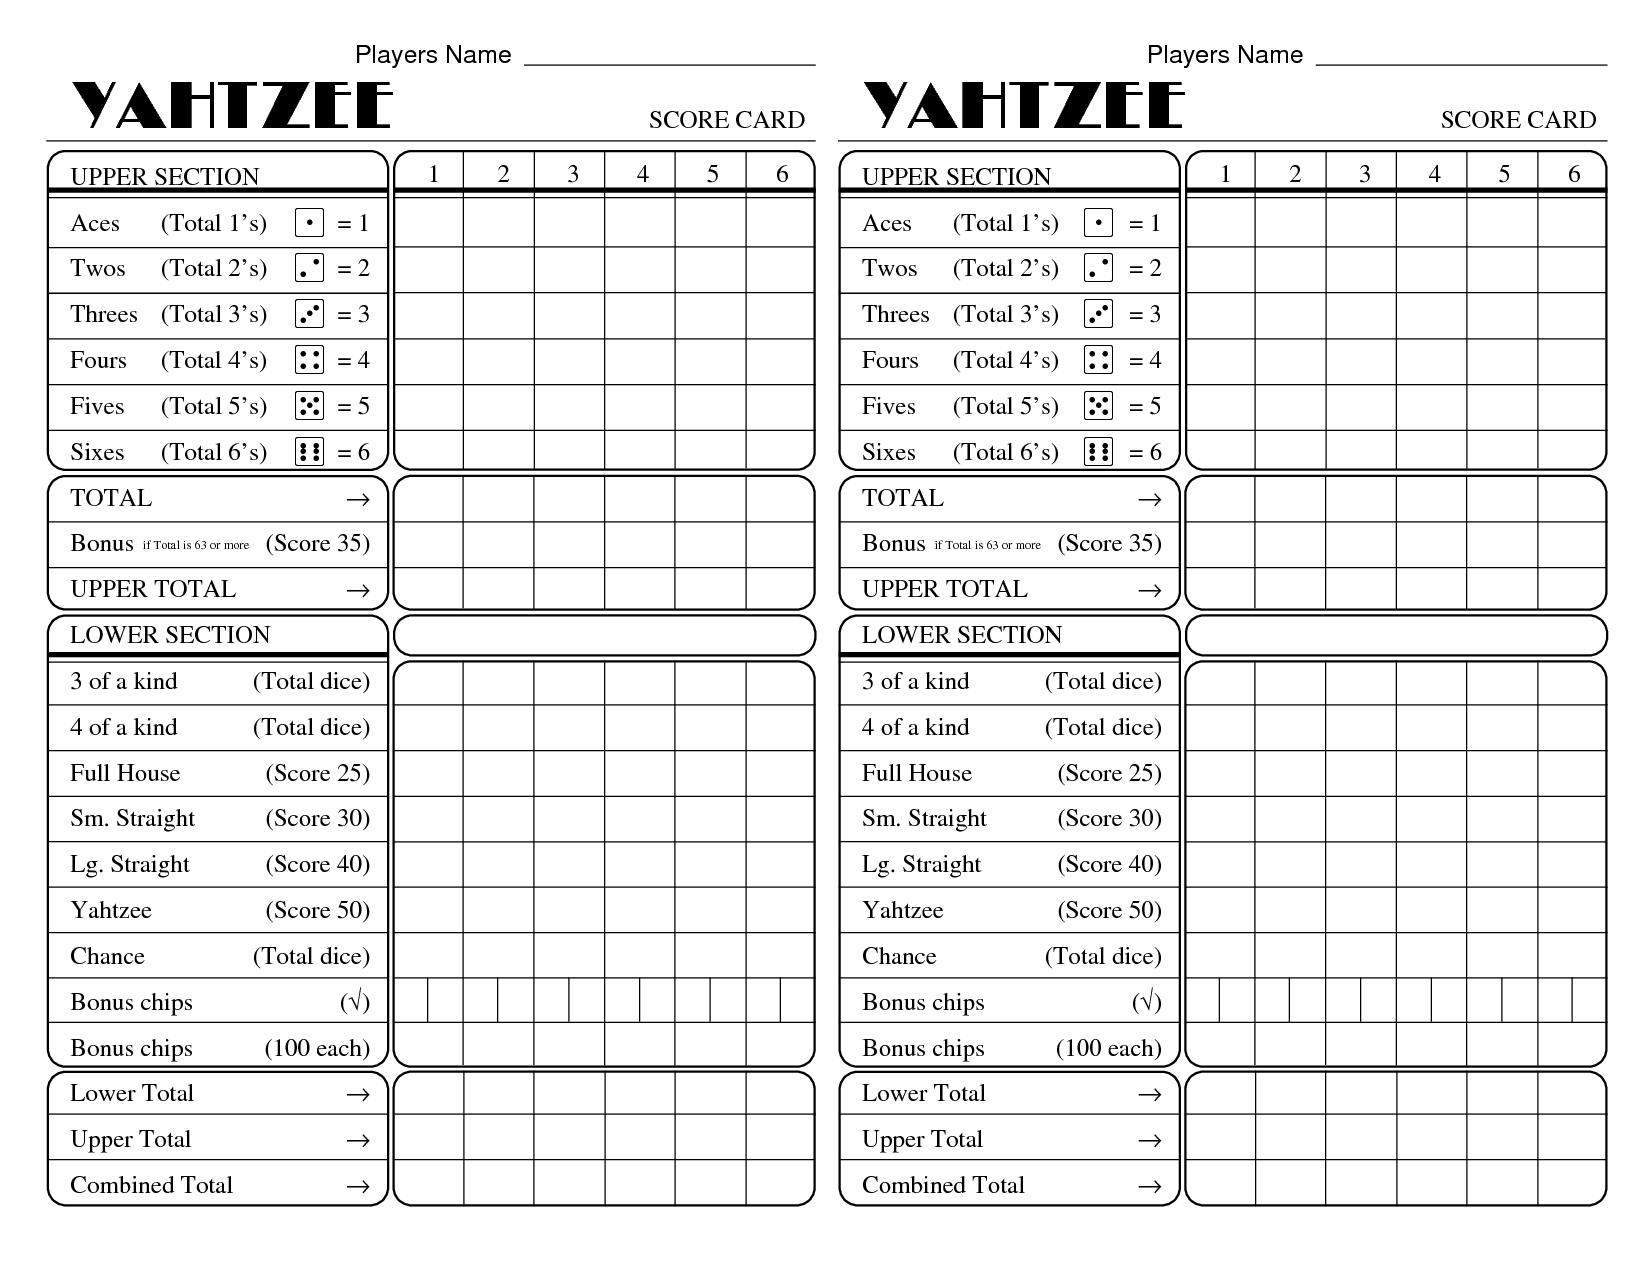 Yatzee Printable Score Sheets | Yahtzee Score Card | All For Fun - Free Printable Yahtzee Score Sheets